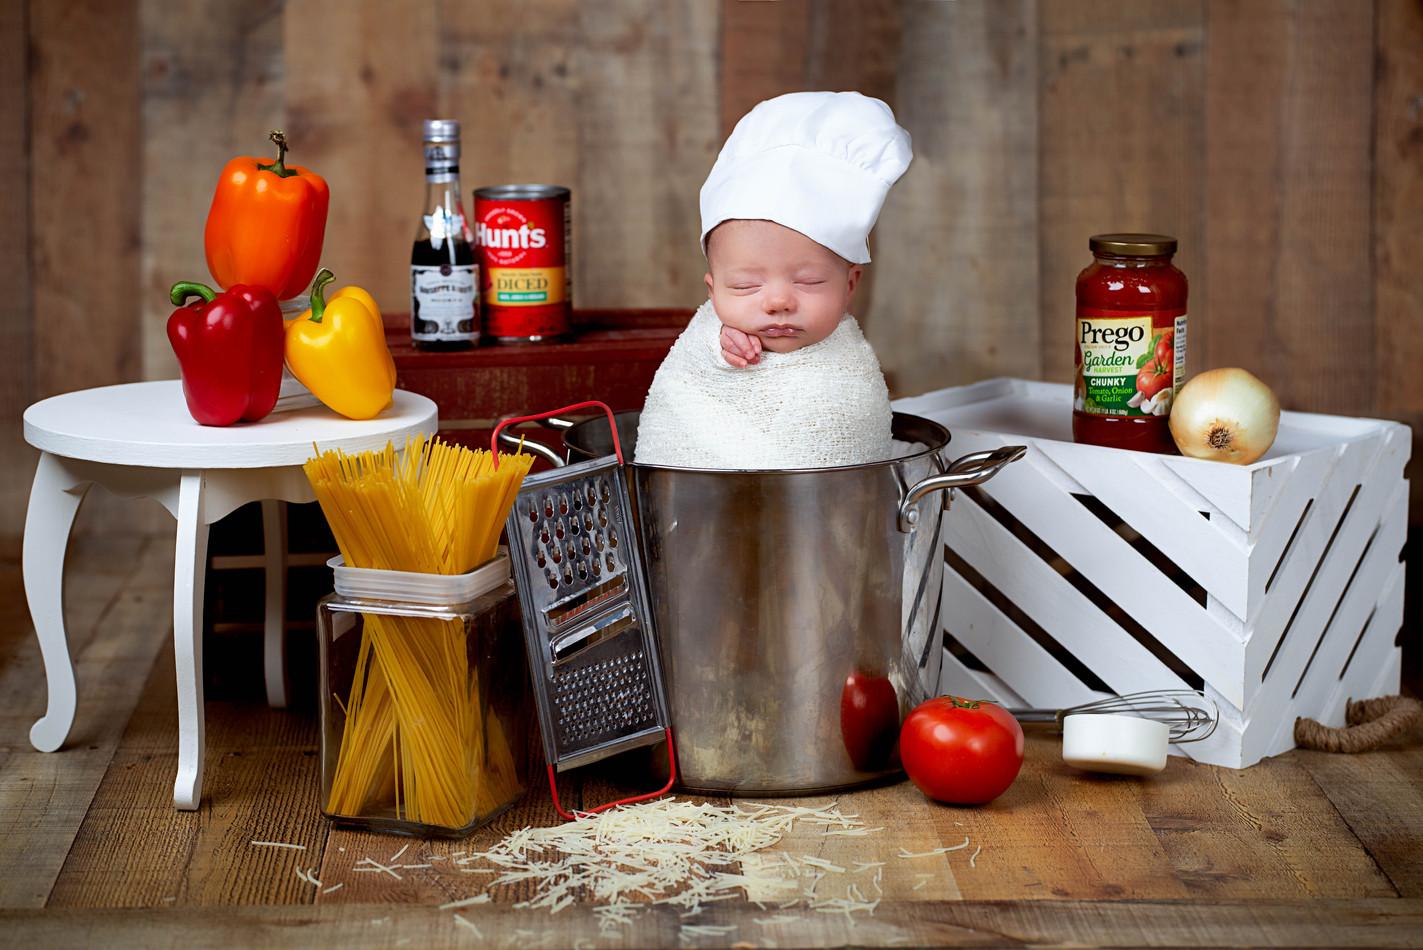 Baby Chef newborn picture